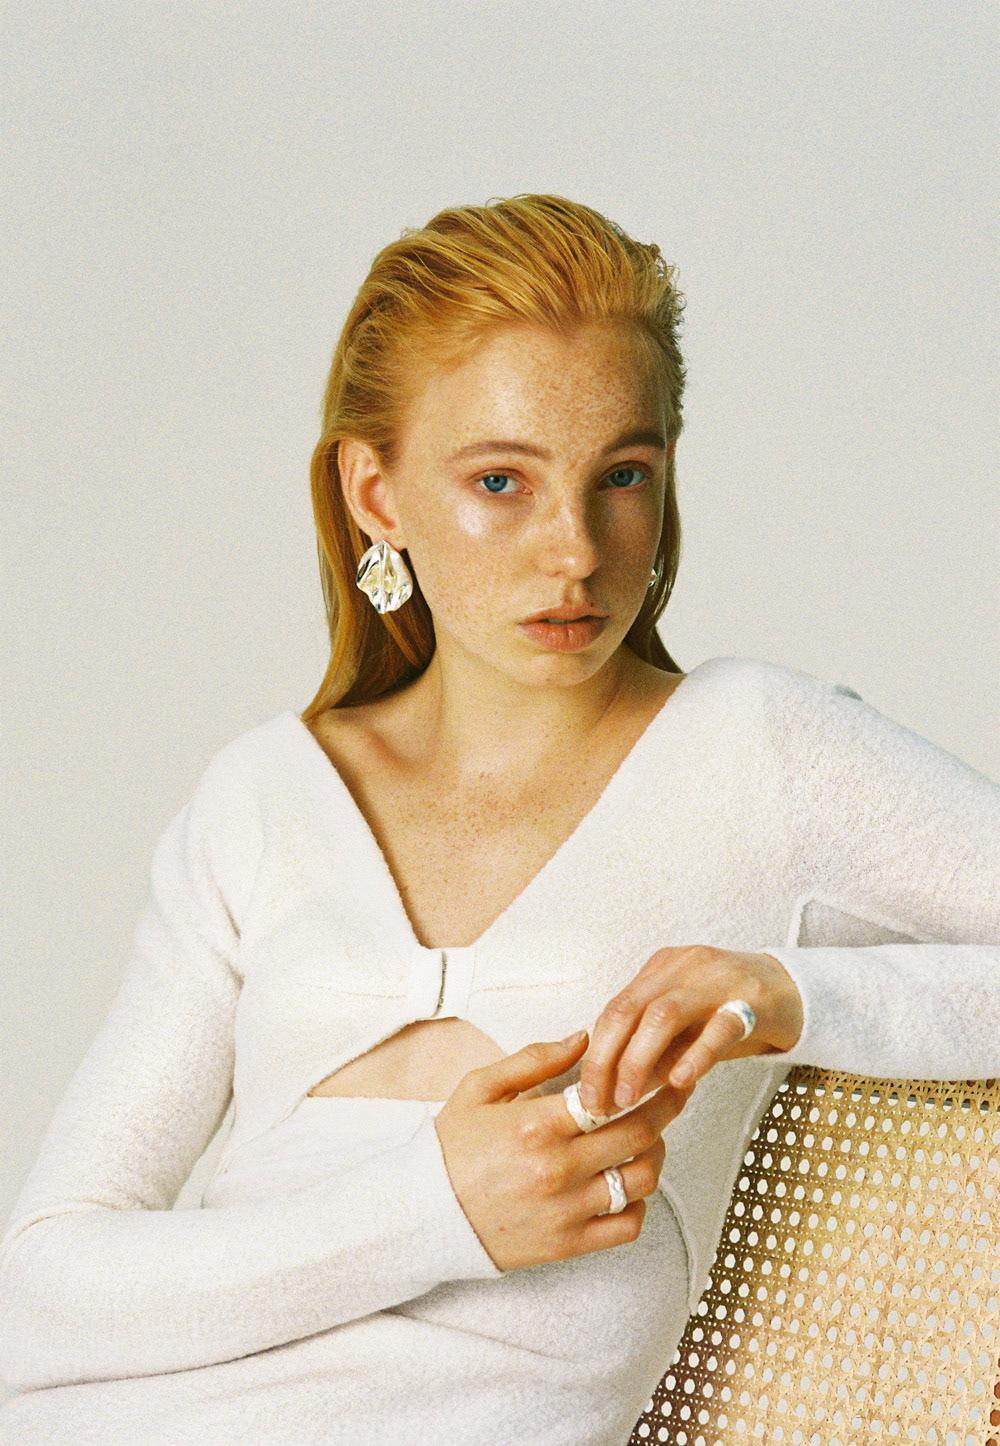 analog bildbehandling Film   hand made jewellry portrait Post Production RECYCLED retouch studio